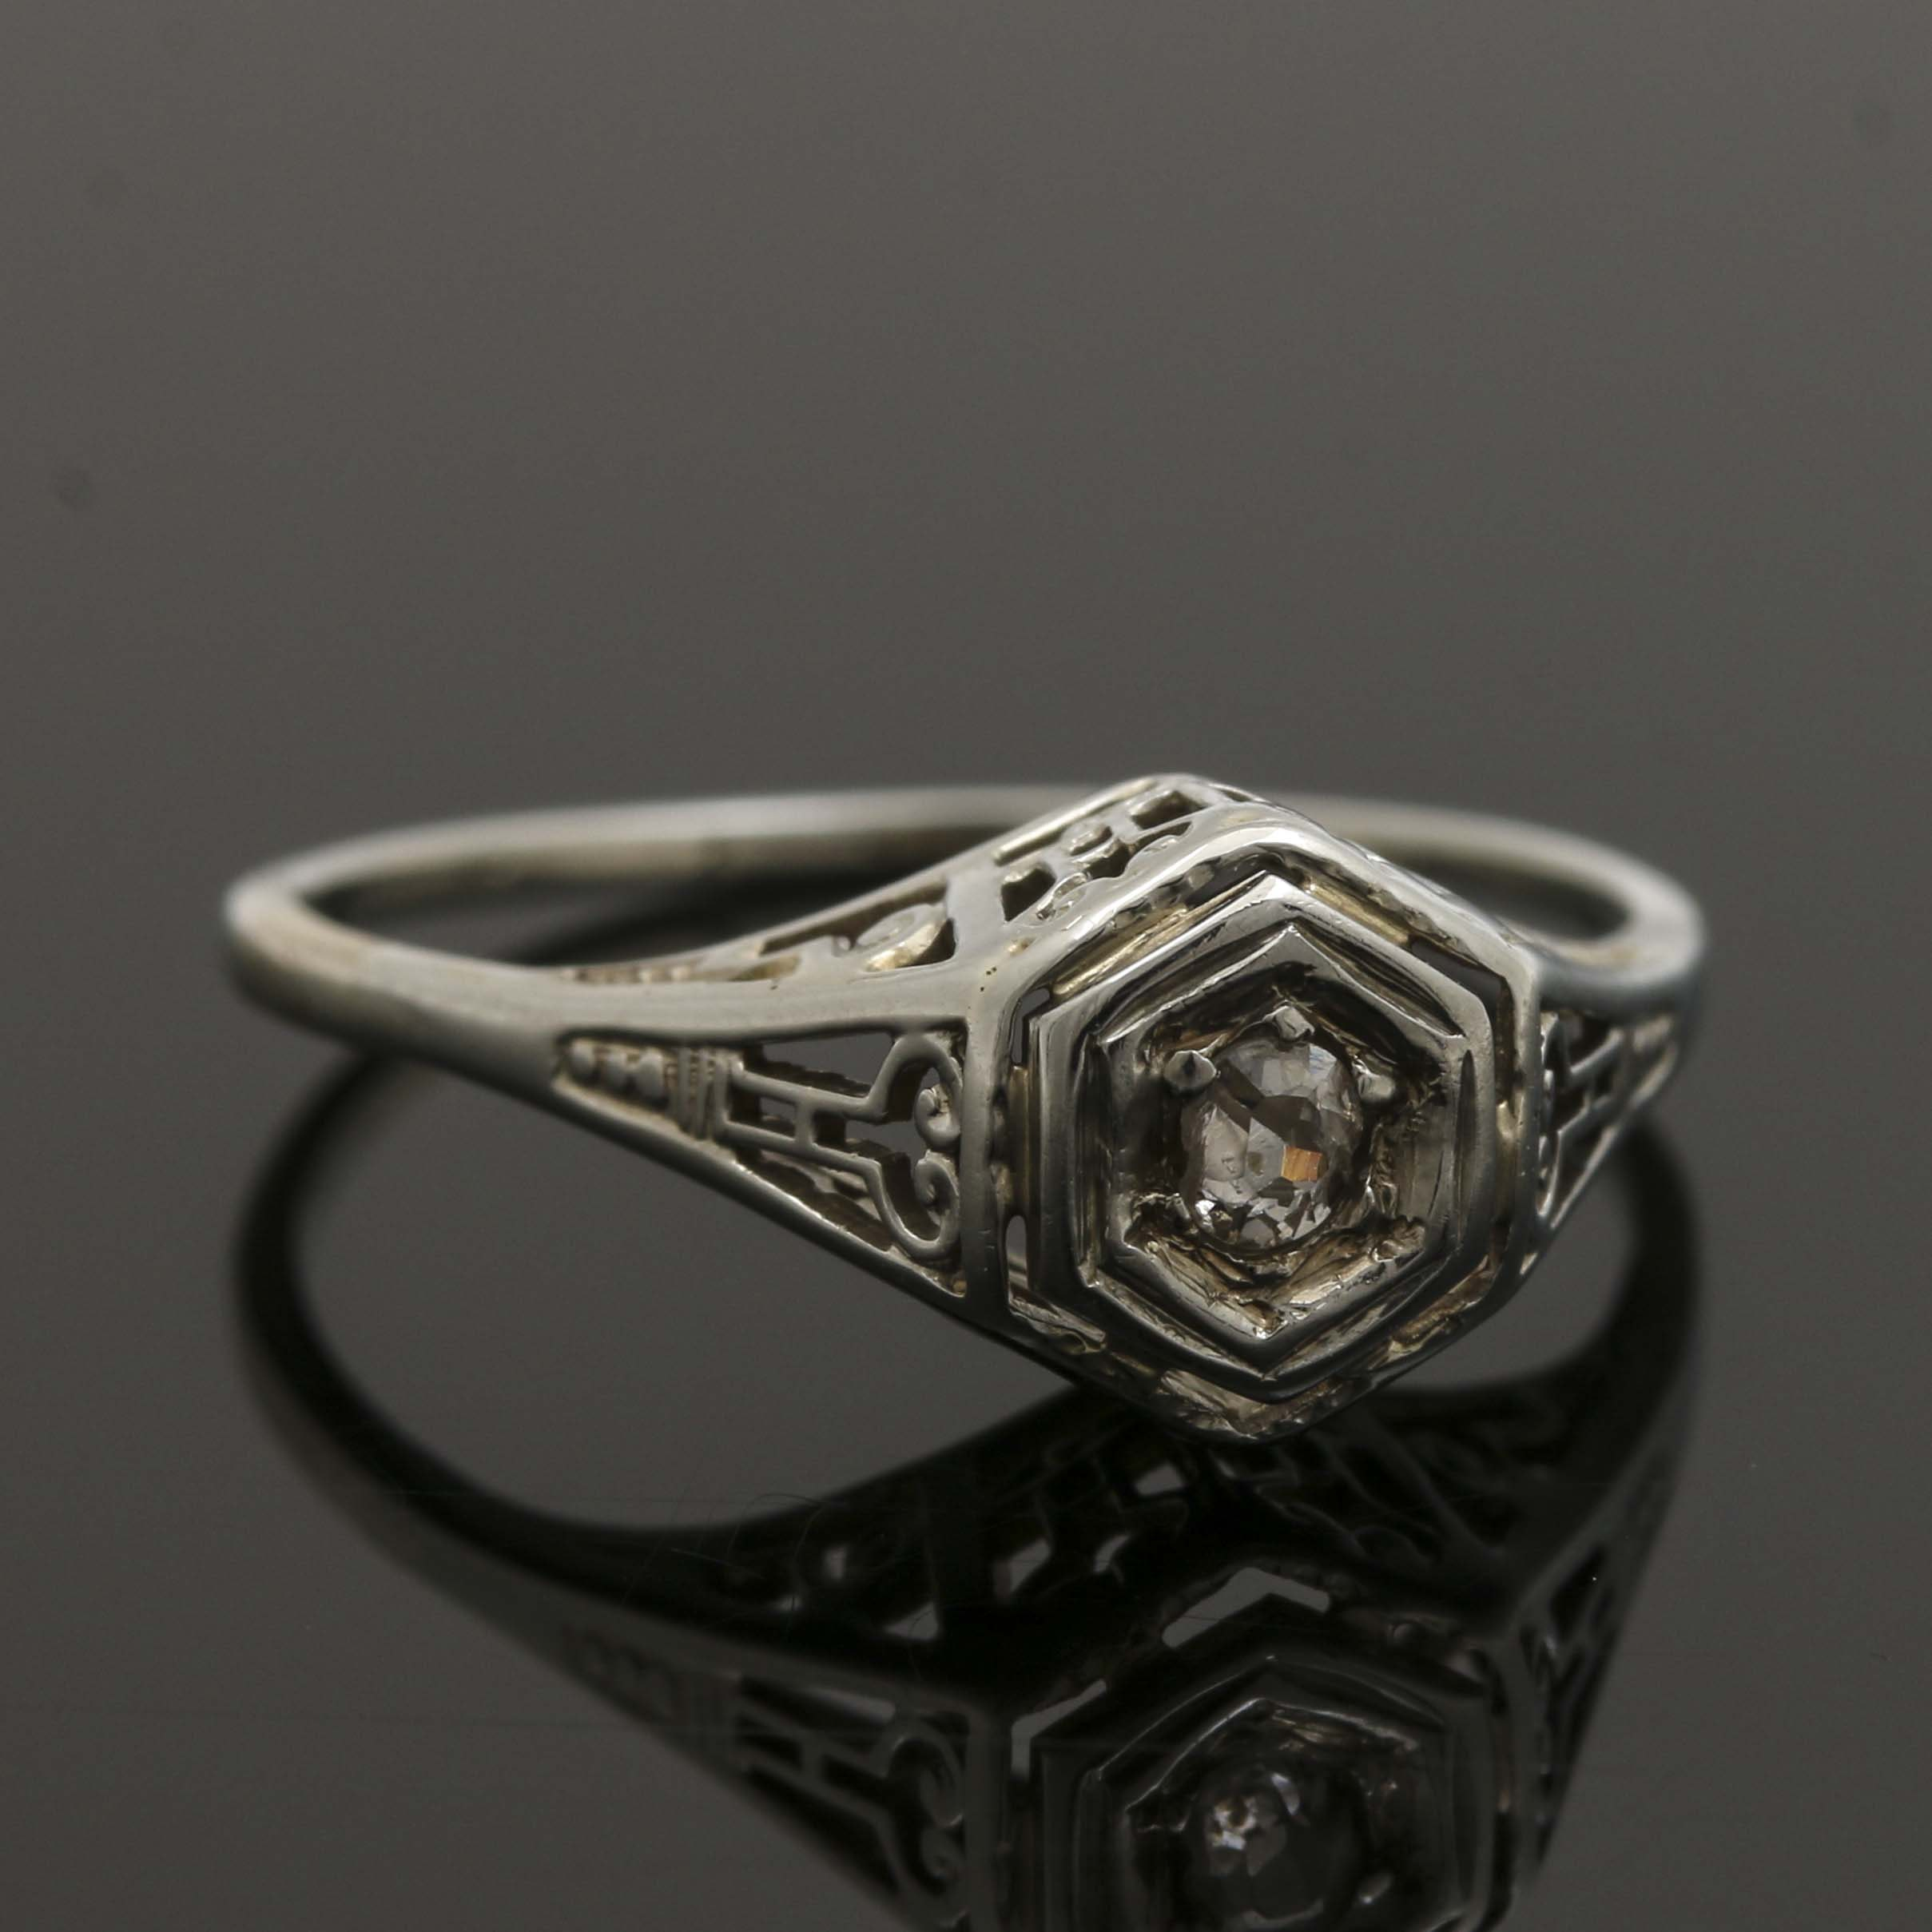 Late Edwardian 14K and 18K White Gold Diamond Ring